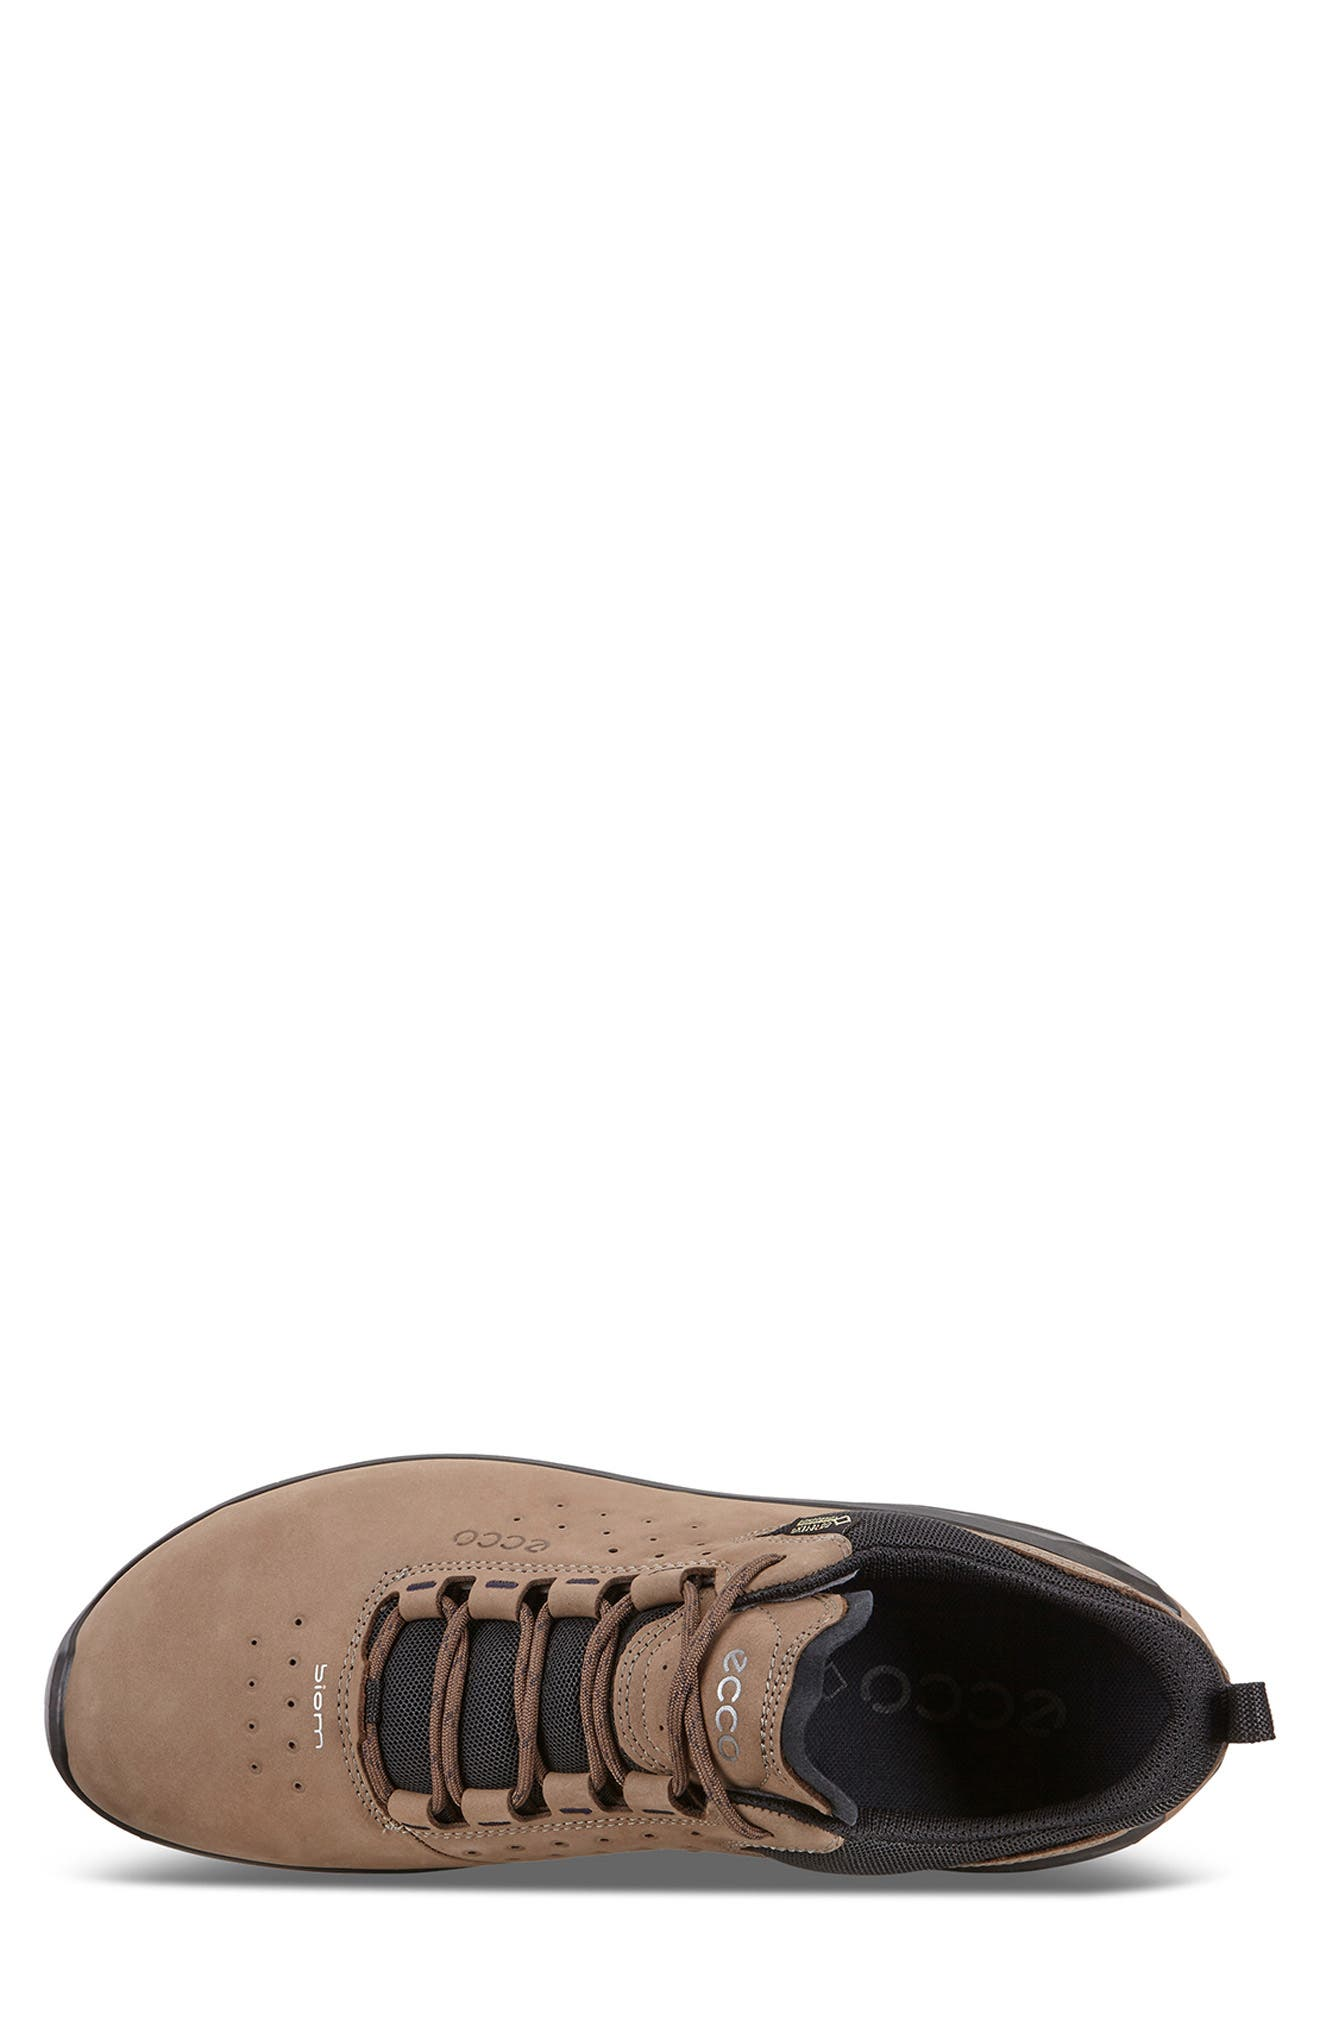 Biom Venture GTX Sneaker,                             Alternate thumbnail 3, color,                             BIRCH BROWN LEATHER